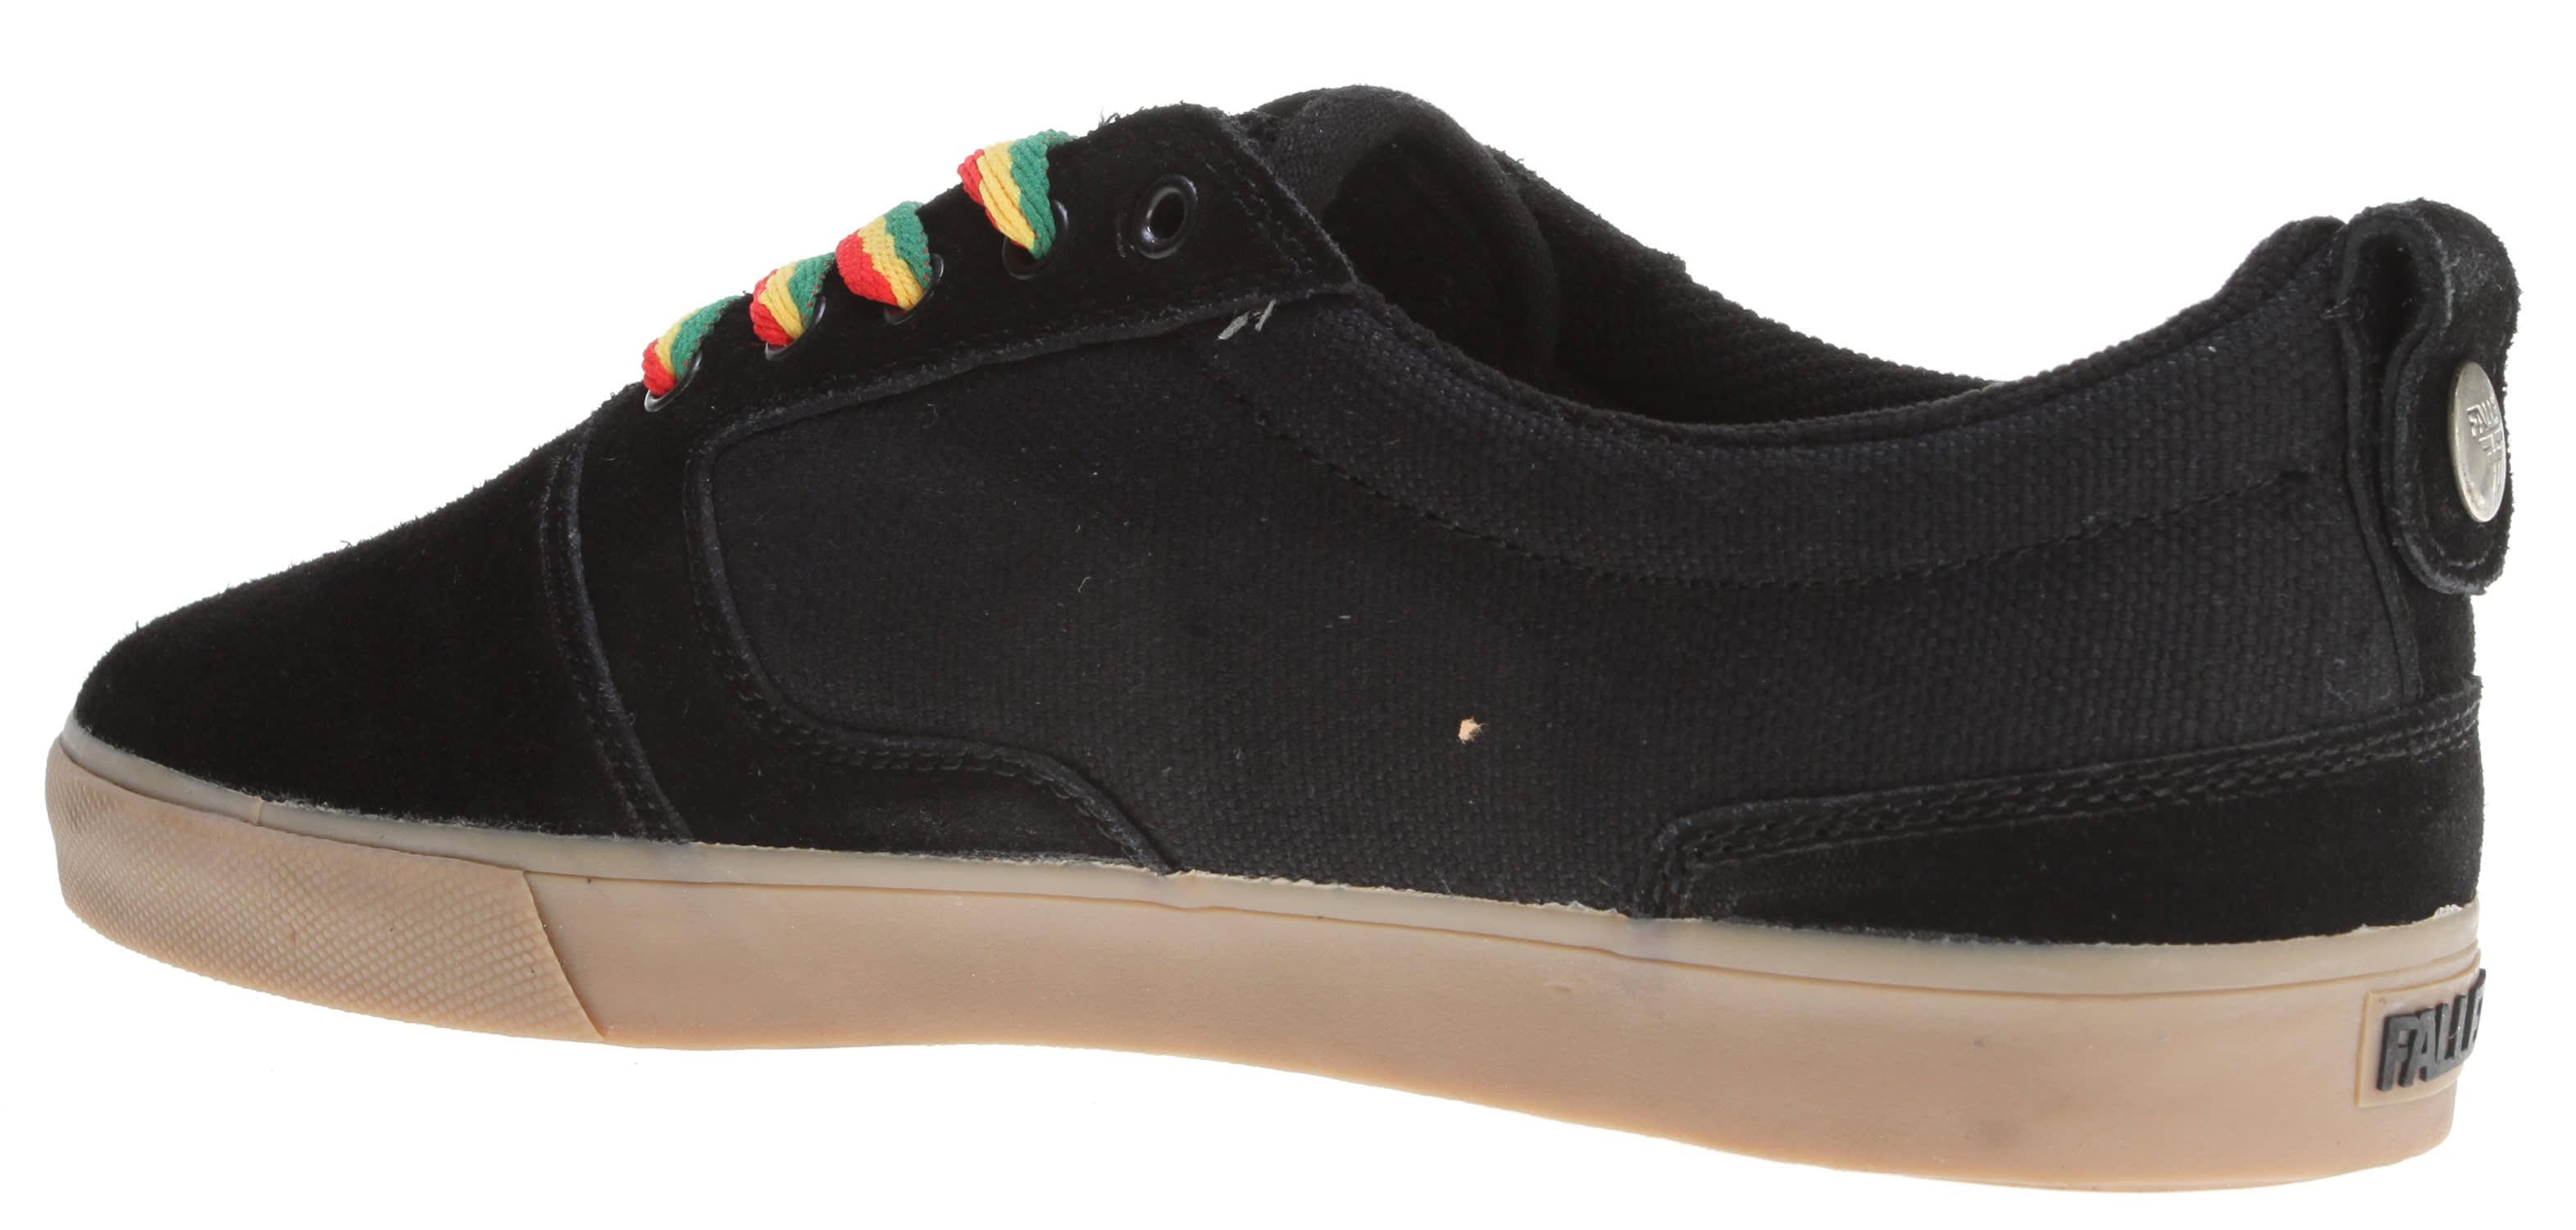 Skate shoes kingston - Fallen Kingston Skate Shoes Thumbnail 3